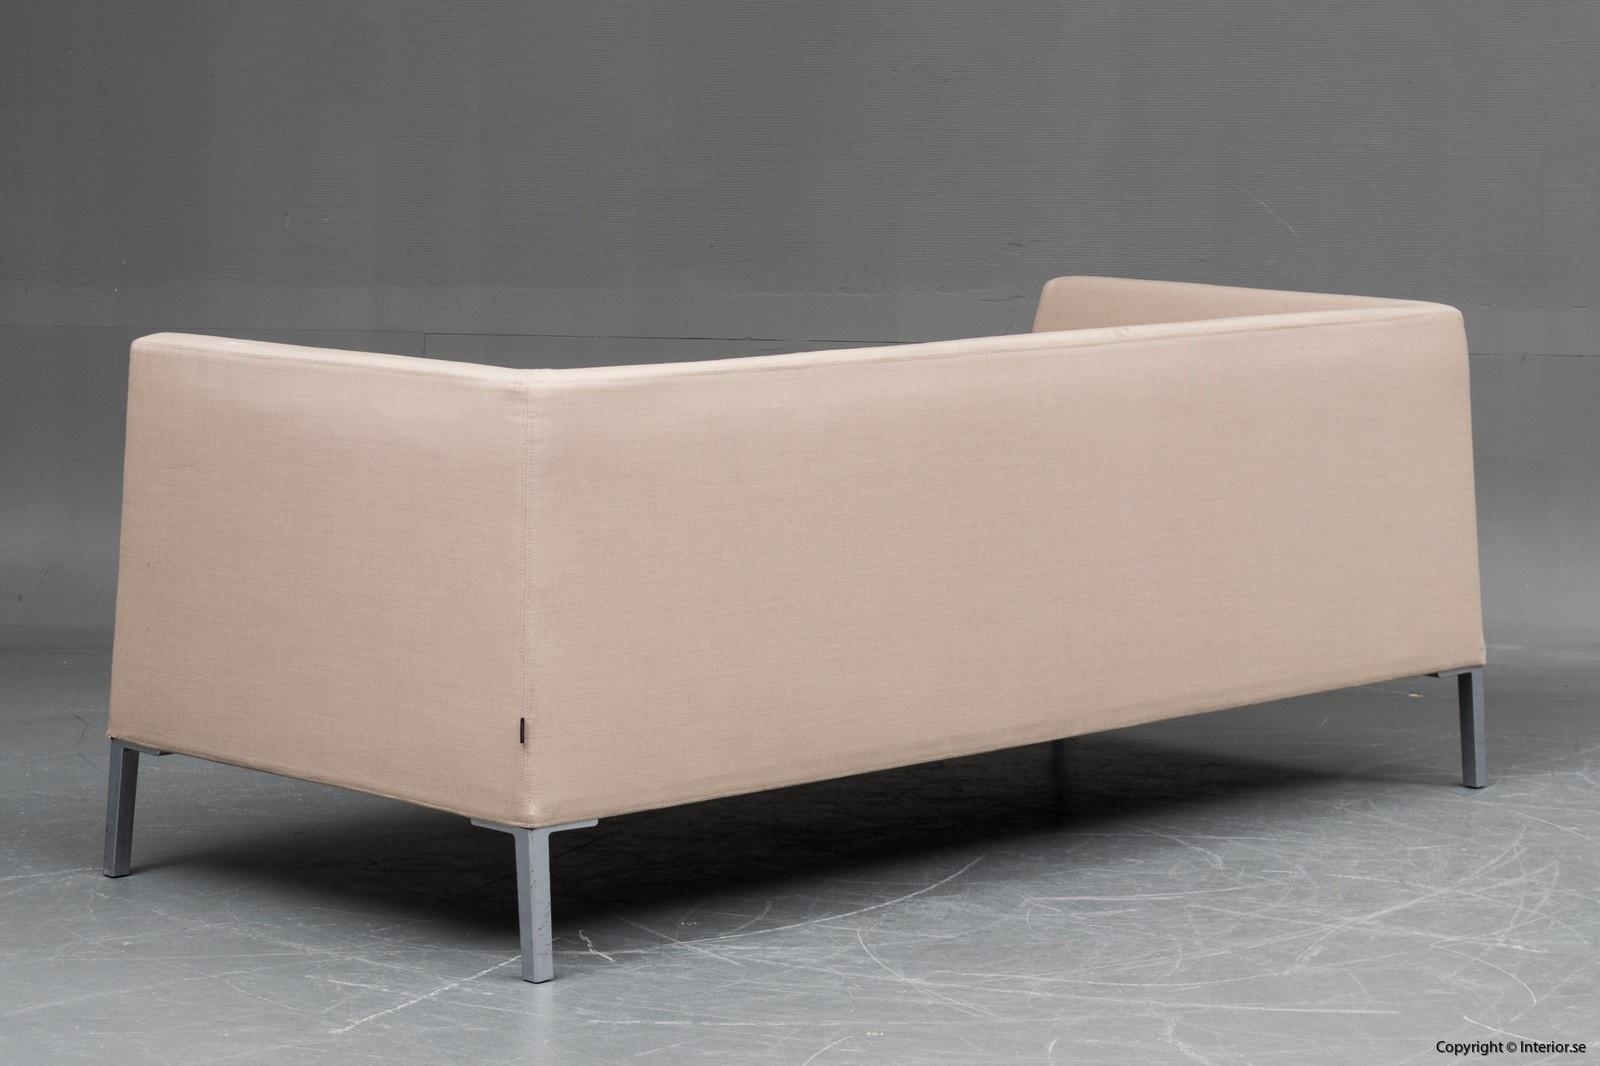 1 2-sits soffa, Paustian Eilersen Lounge - Hiorth Lorenzen & Foersom 7